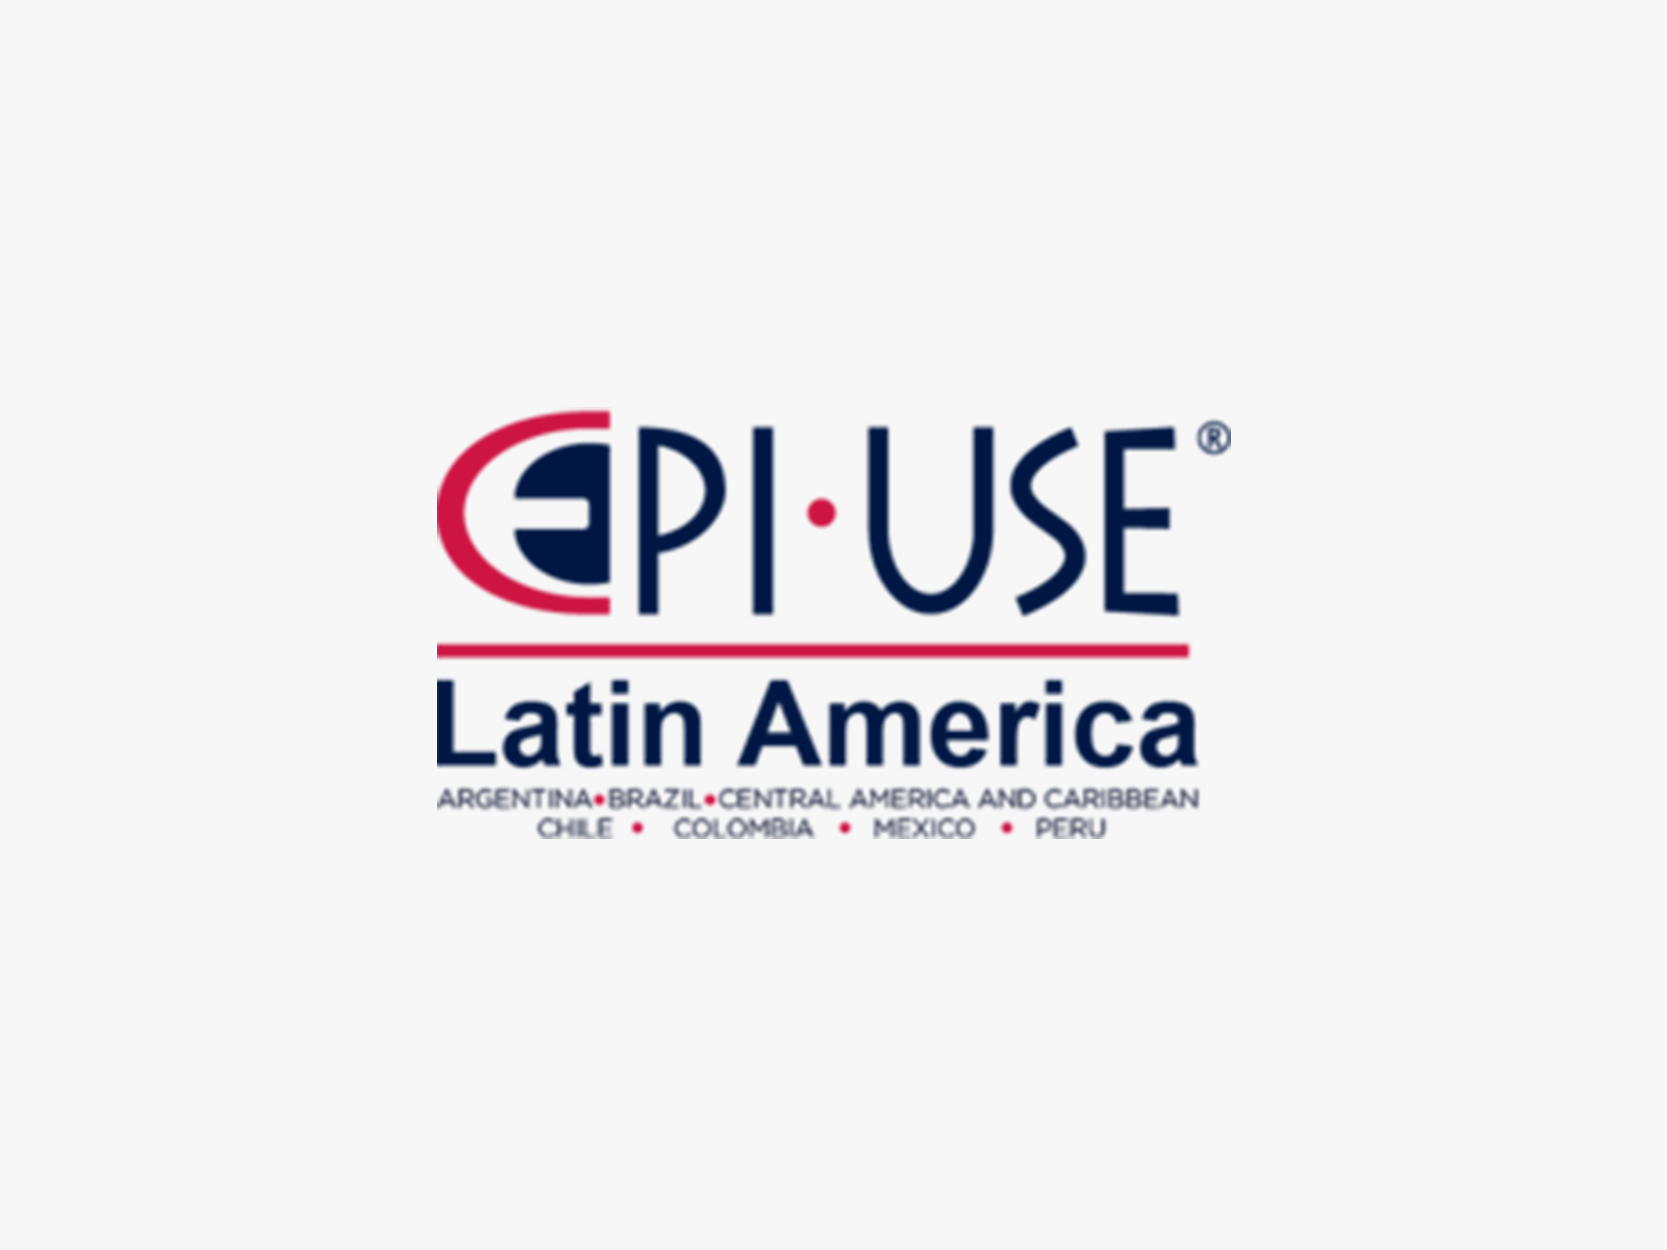 EPIUSE Latin.png